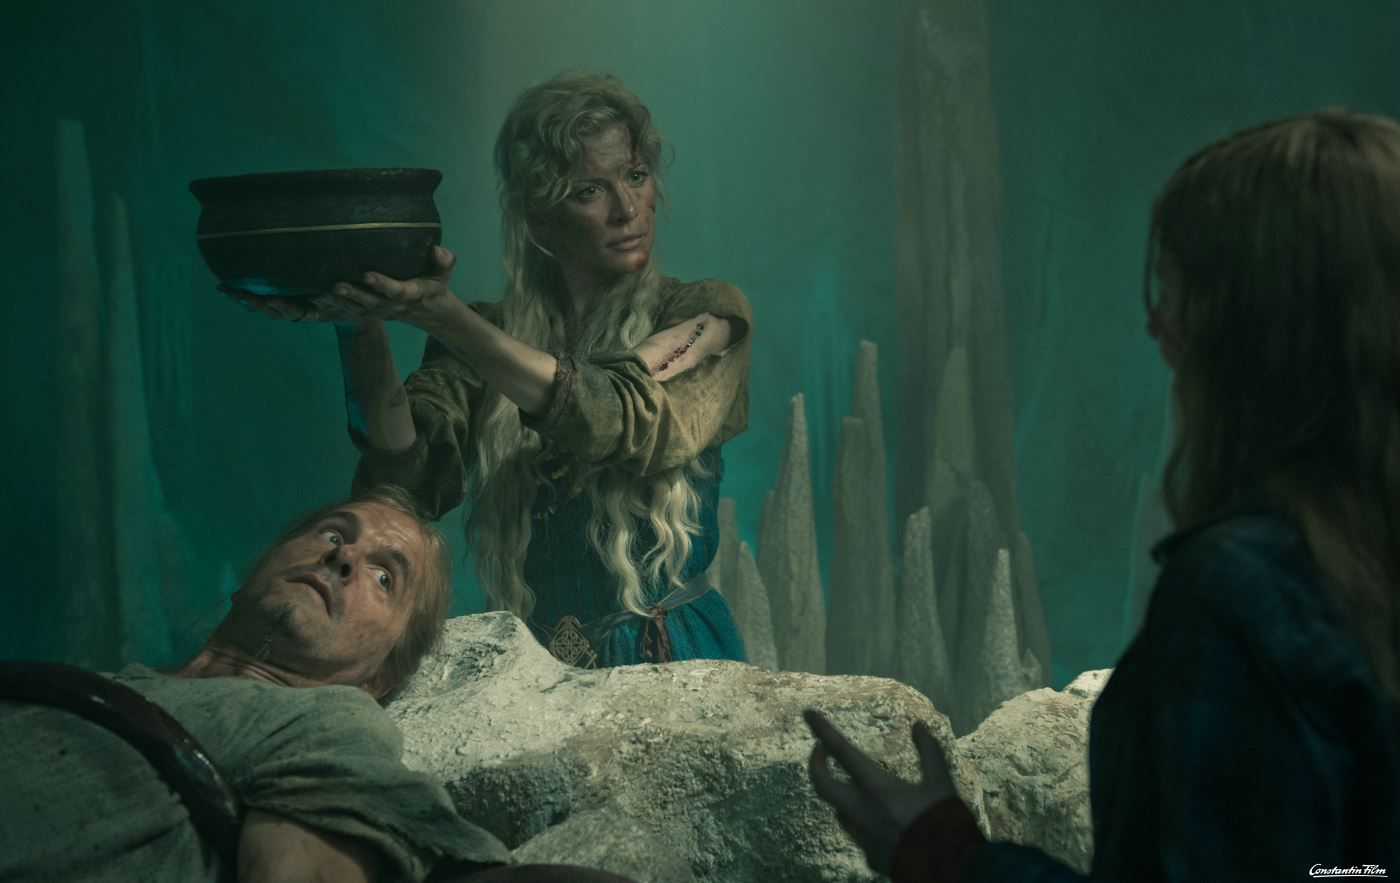 Soll Mara Lilian Prent Loki Christoph Maria Herbst Und Seiner Gattin Sigyn Eva Habermann Vertrauen Fantasy Films Fantasy Mythology